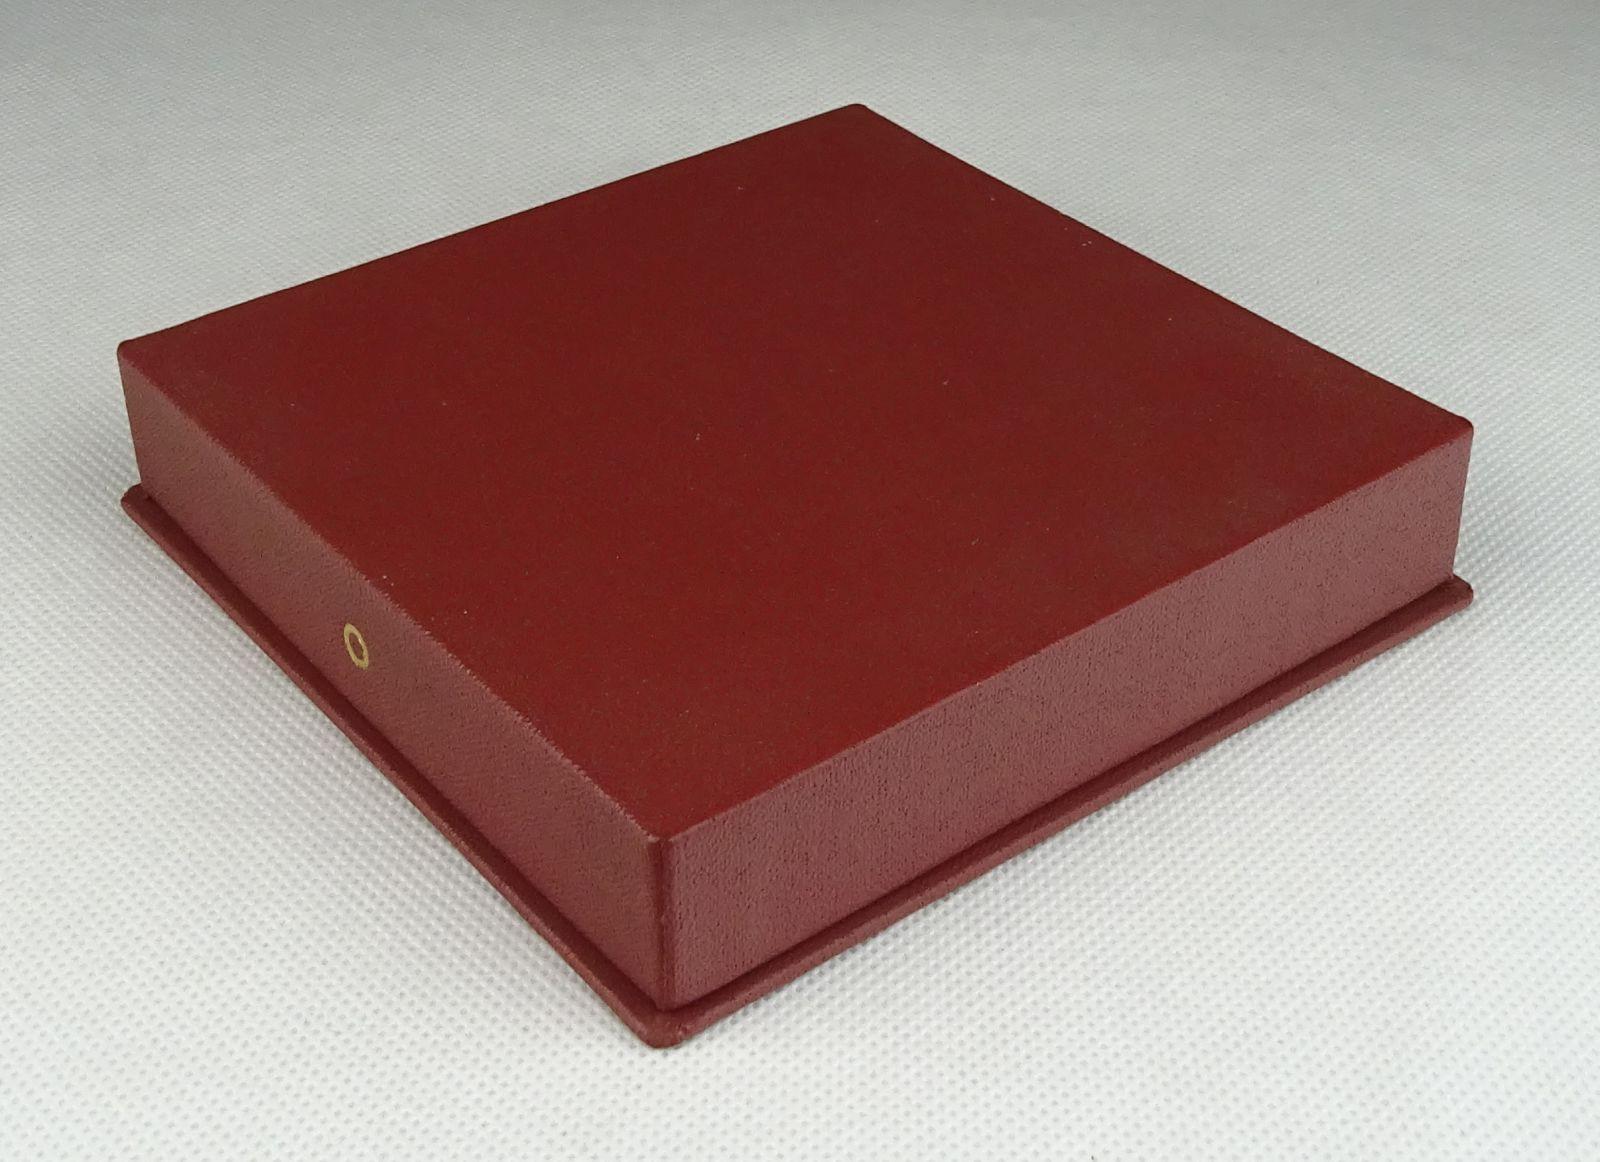 DSC02472.JPG (1600×1162)